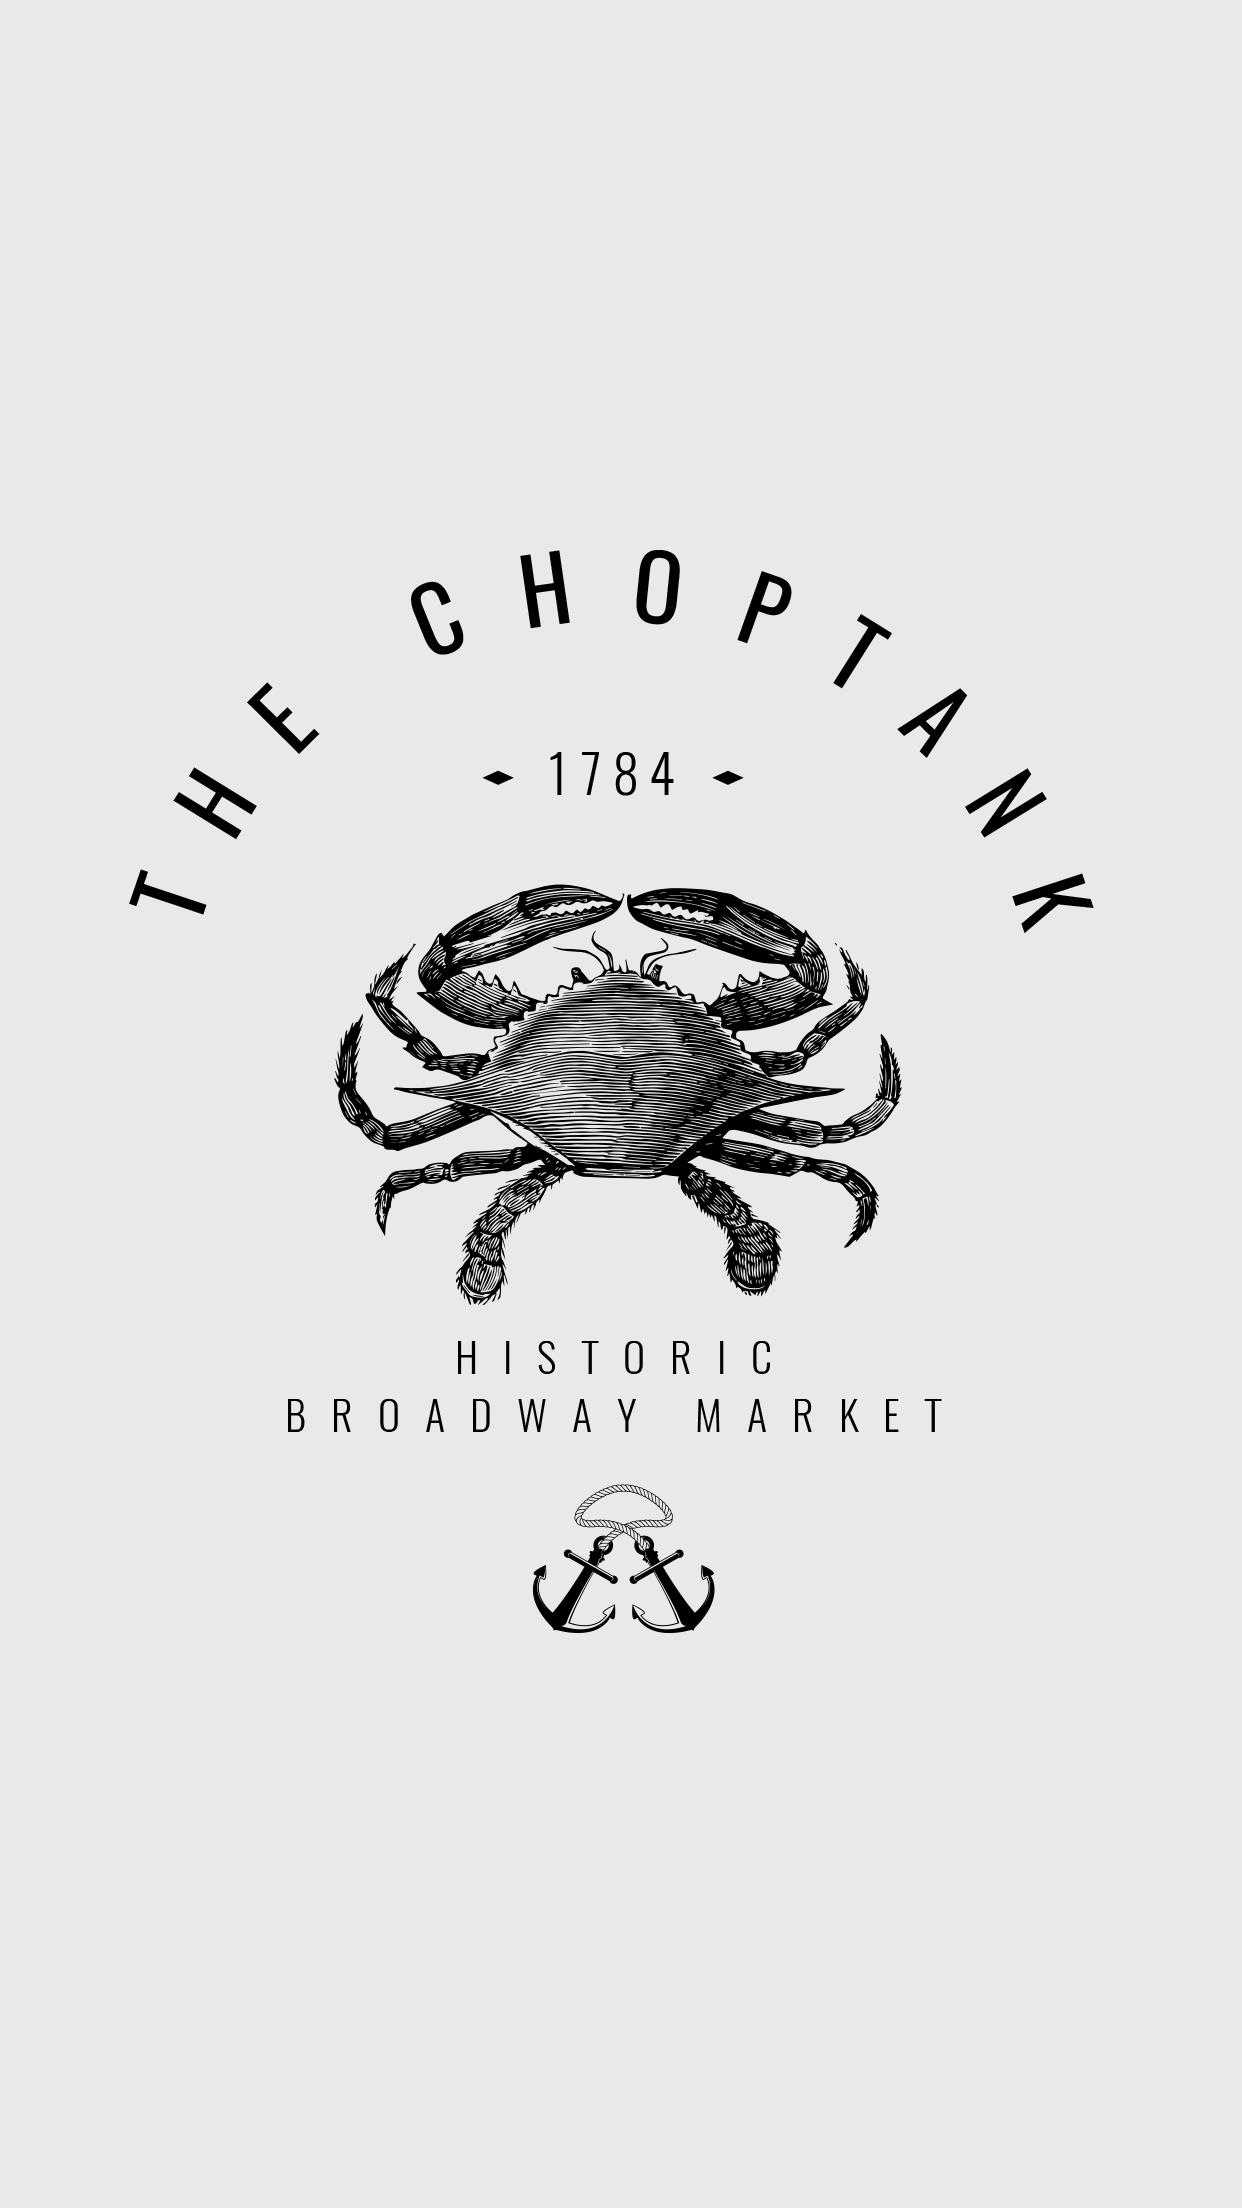 The Choptank Seafood Restaurant Branding And Identity